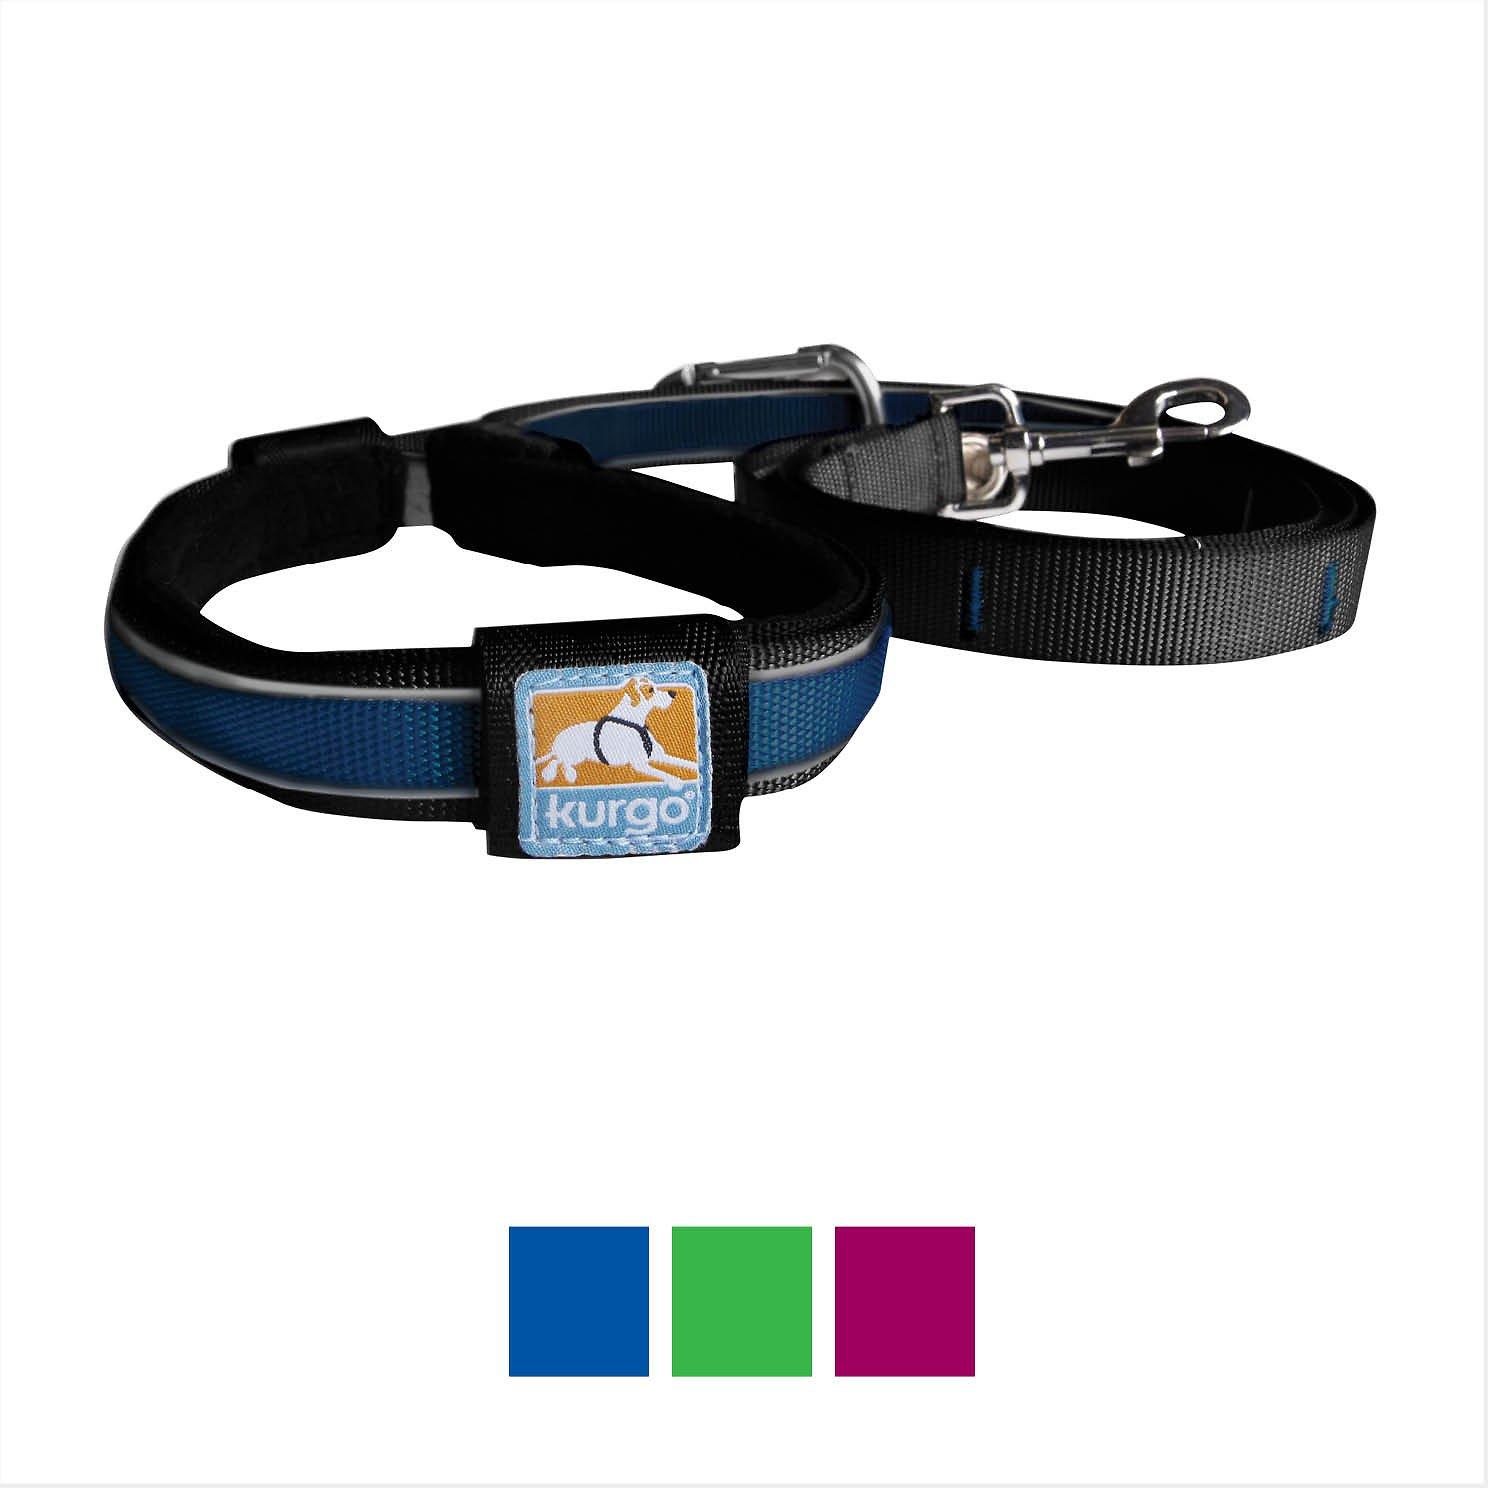 Kurgo Reflect & Protect Quantum Dog Leash, Blue